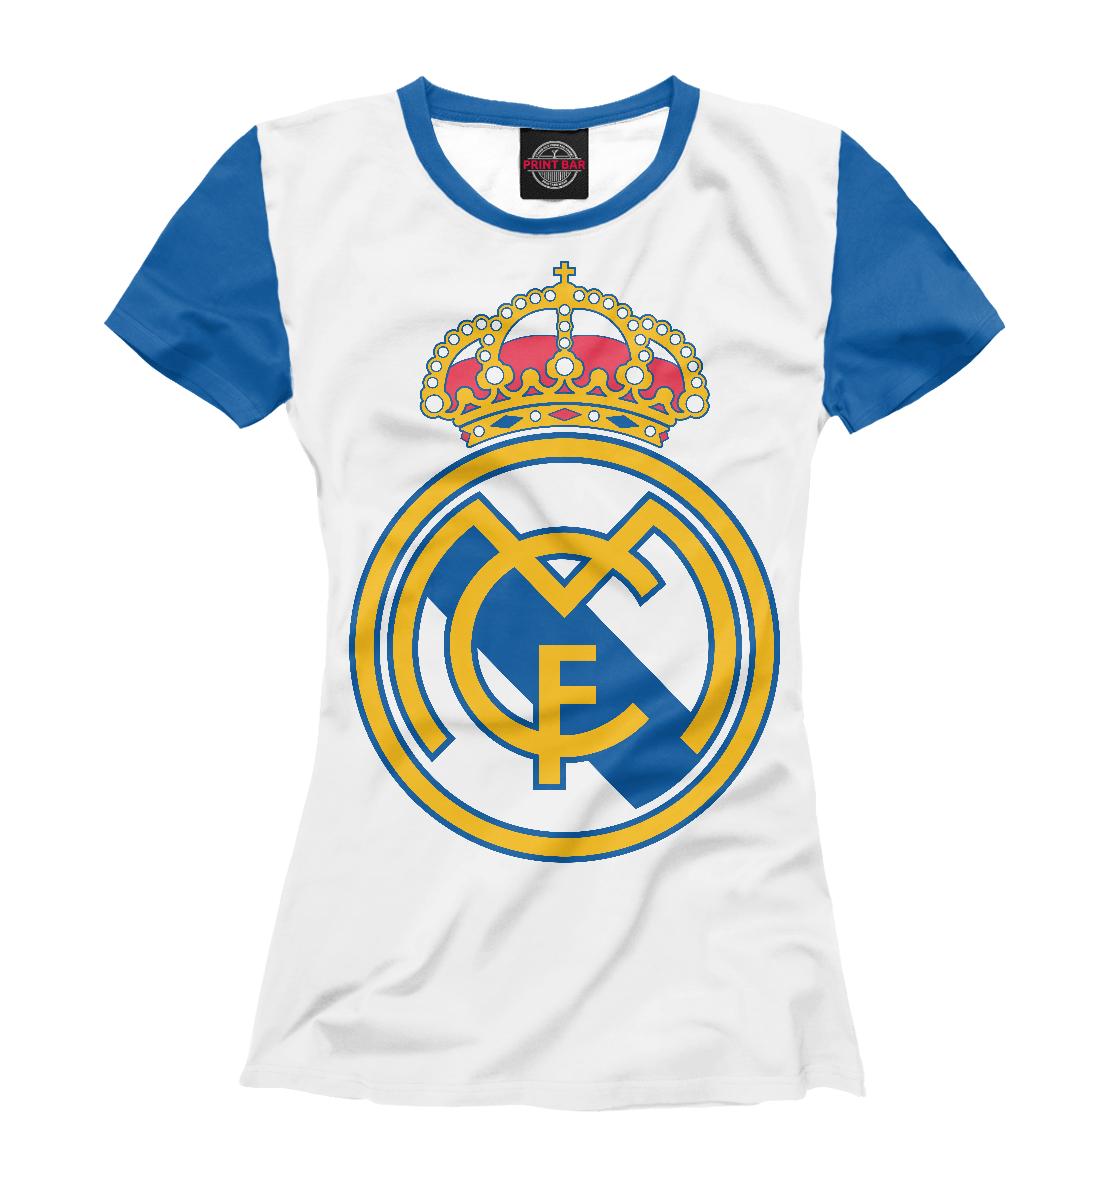 Купить Реал Мадрид, Printbar, Футболки, REA-630152-fut-1